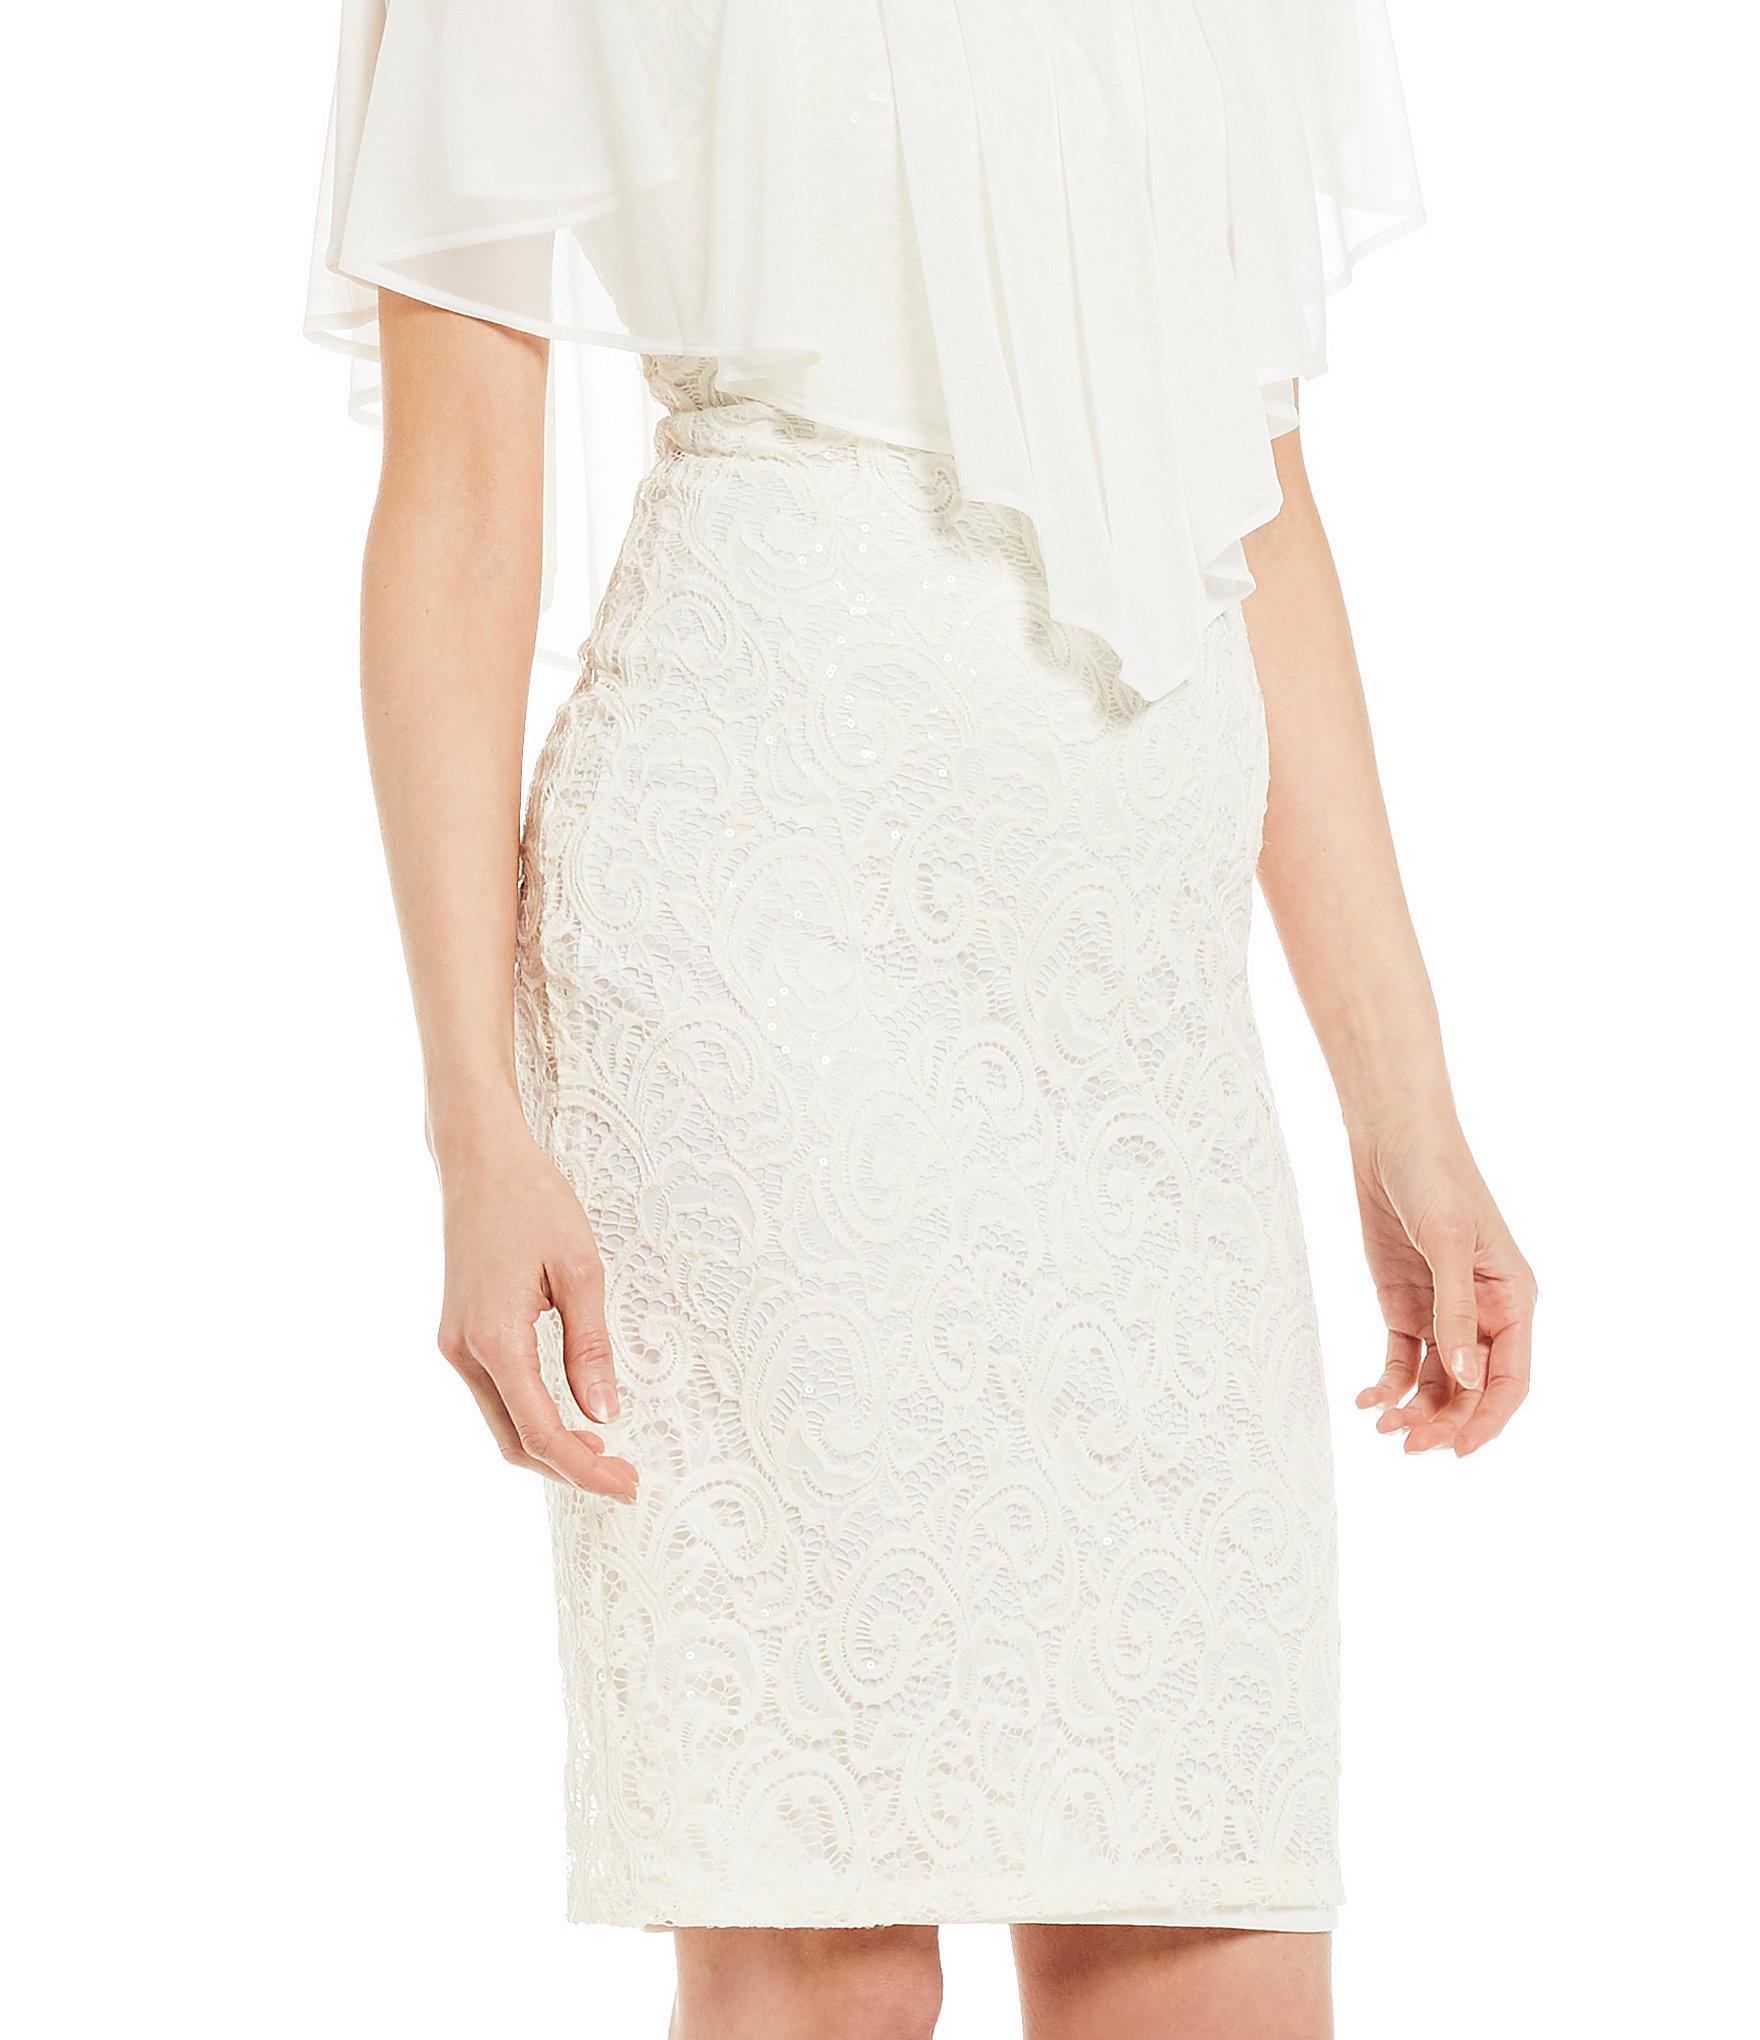 4c1907f91f Marina - White Chiffon Popover Sequin Lace Sheath Dress - Lyst. View  fullscreen